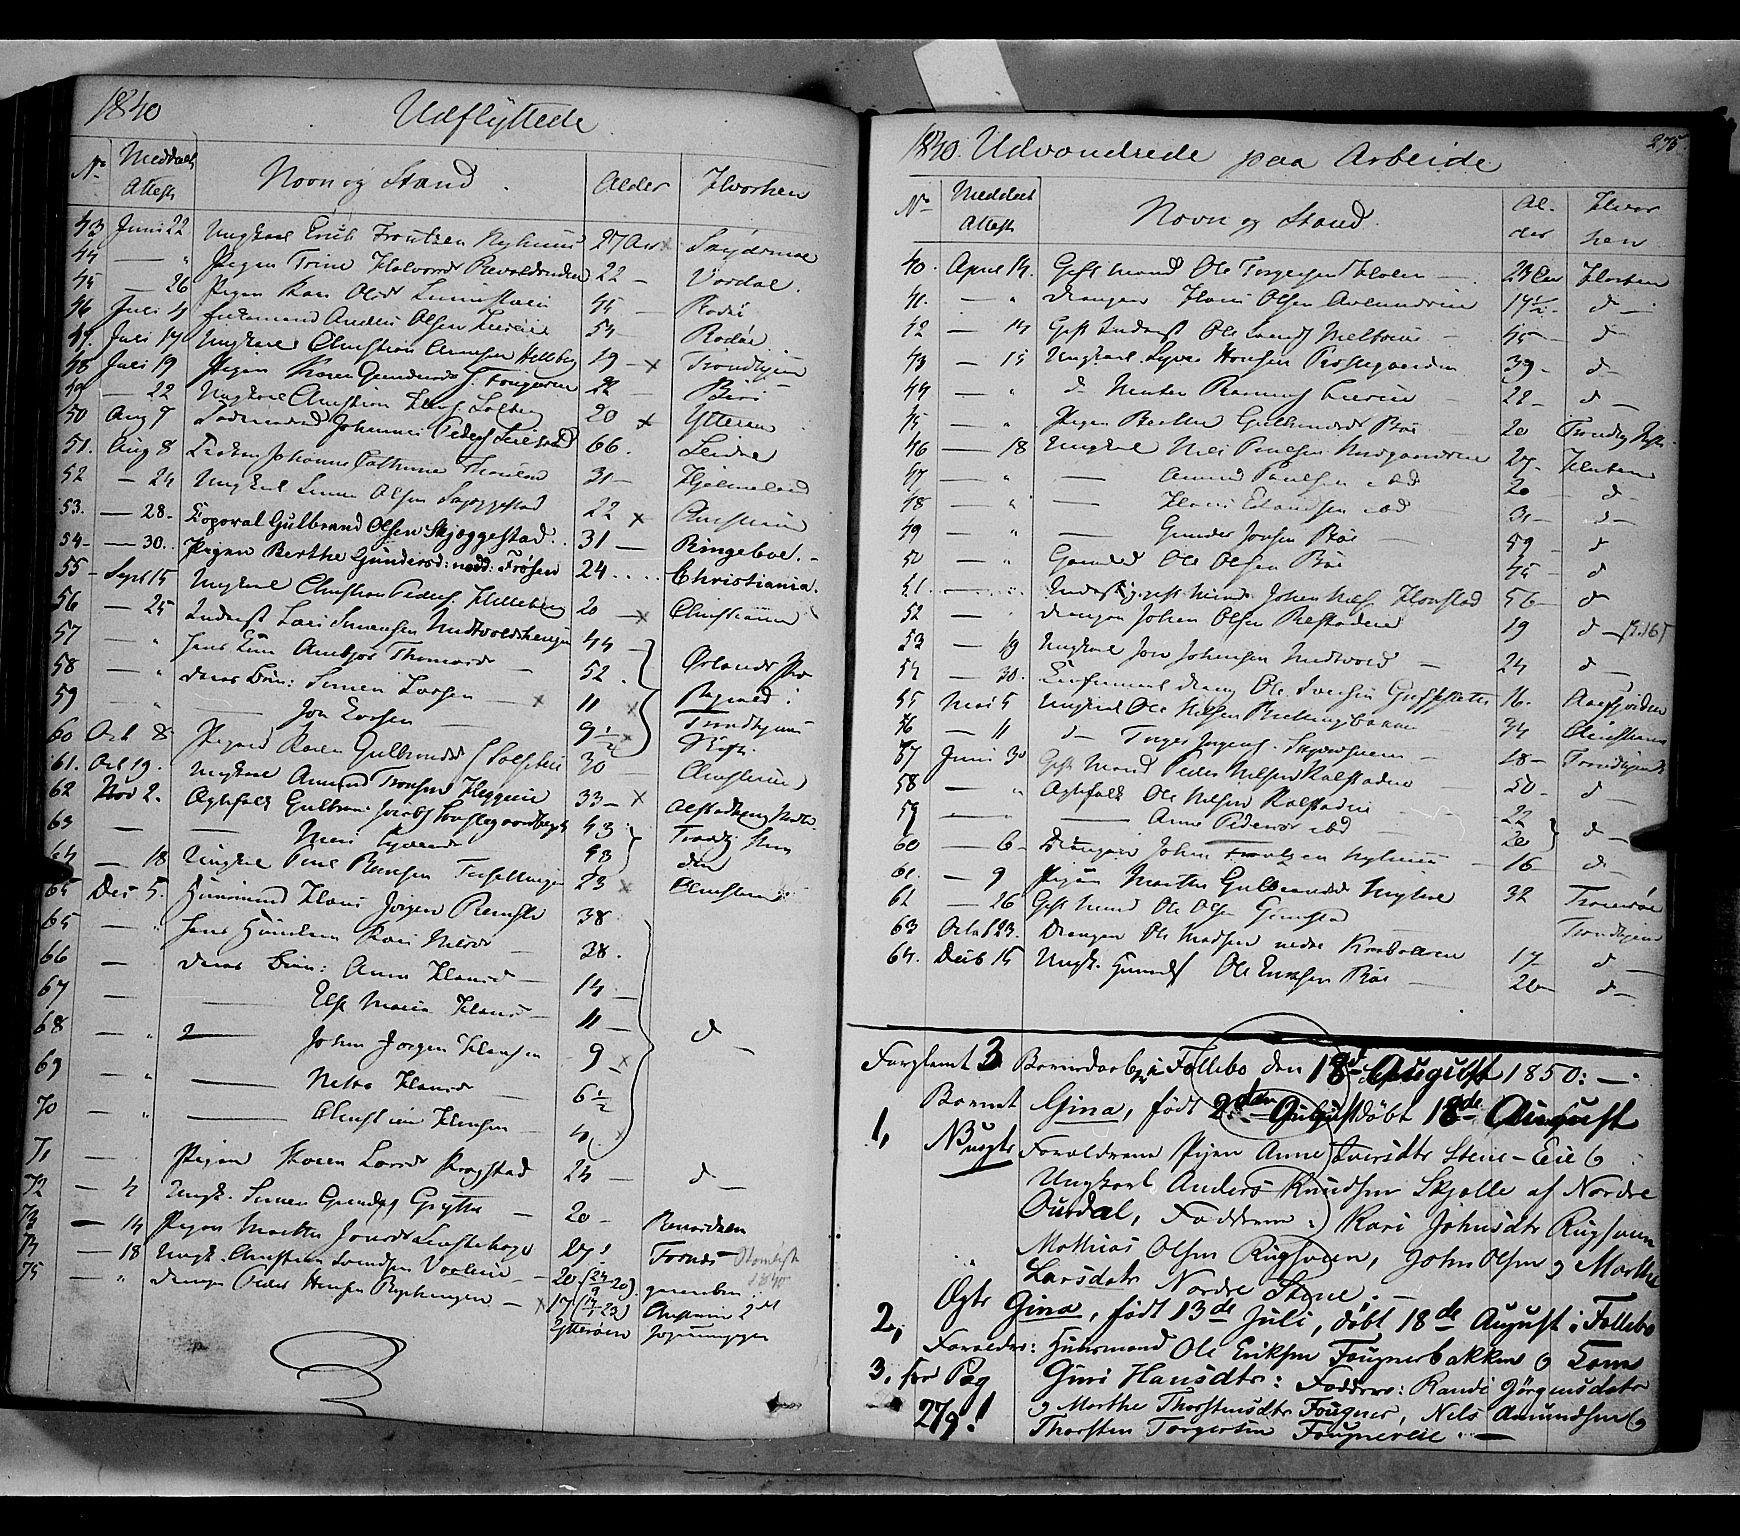 SAH, Gausdal prestekontor, Ministerialbok nr. 7, 1840-1850, s. 275